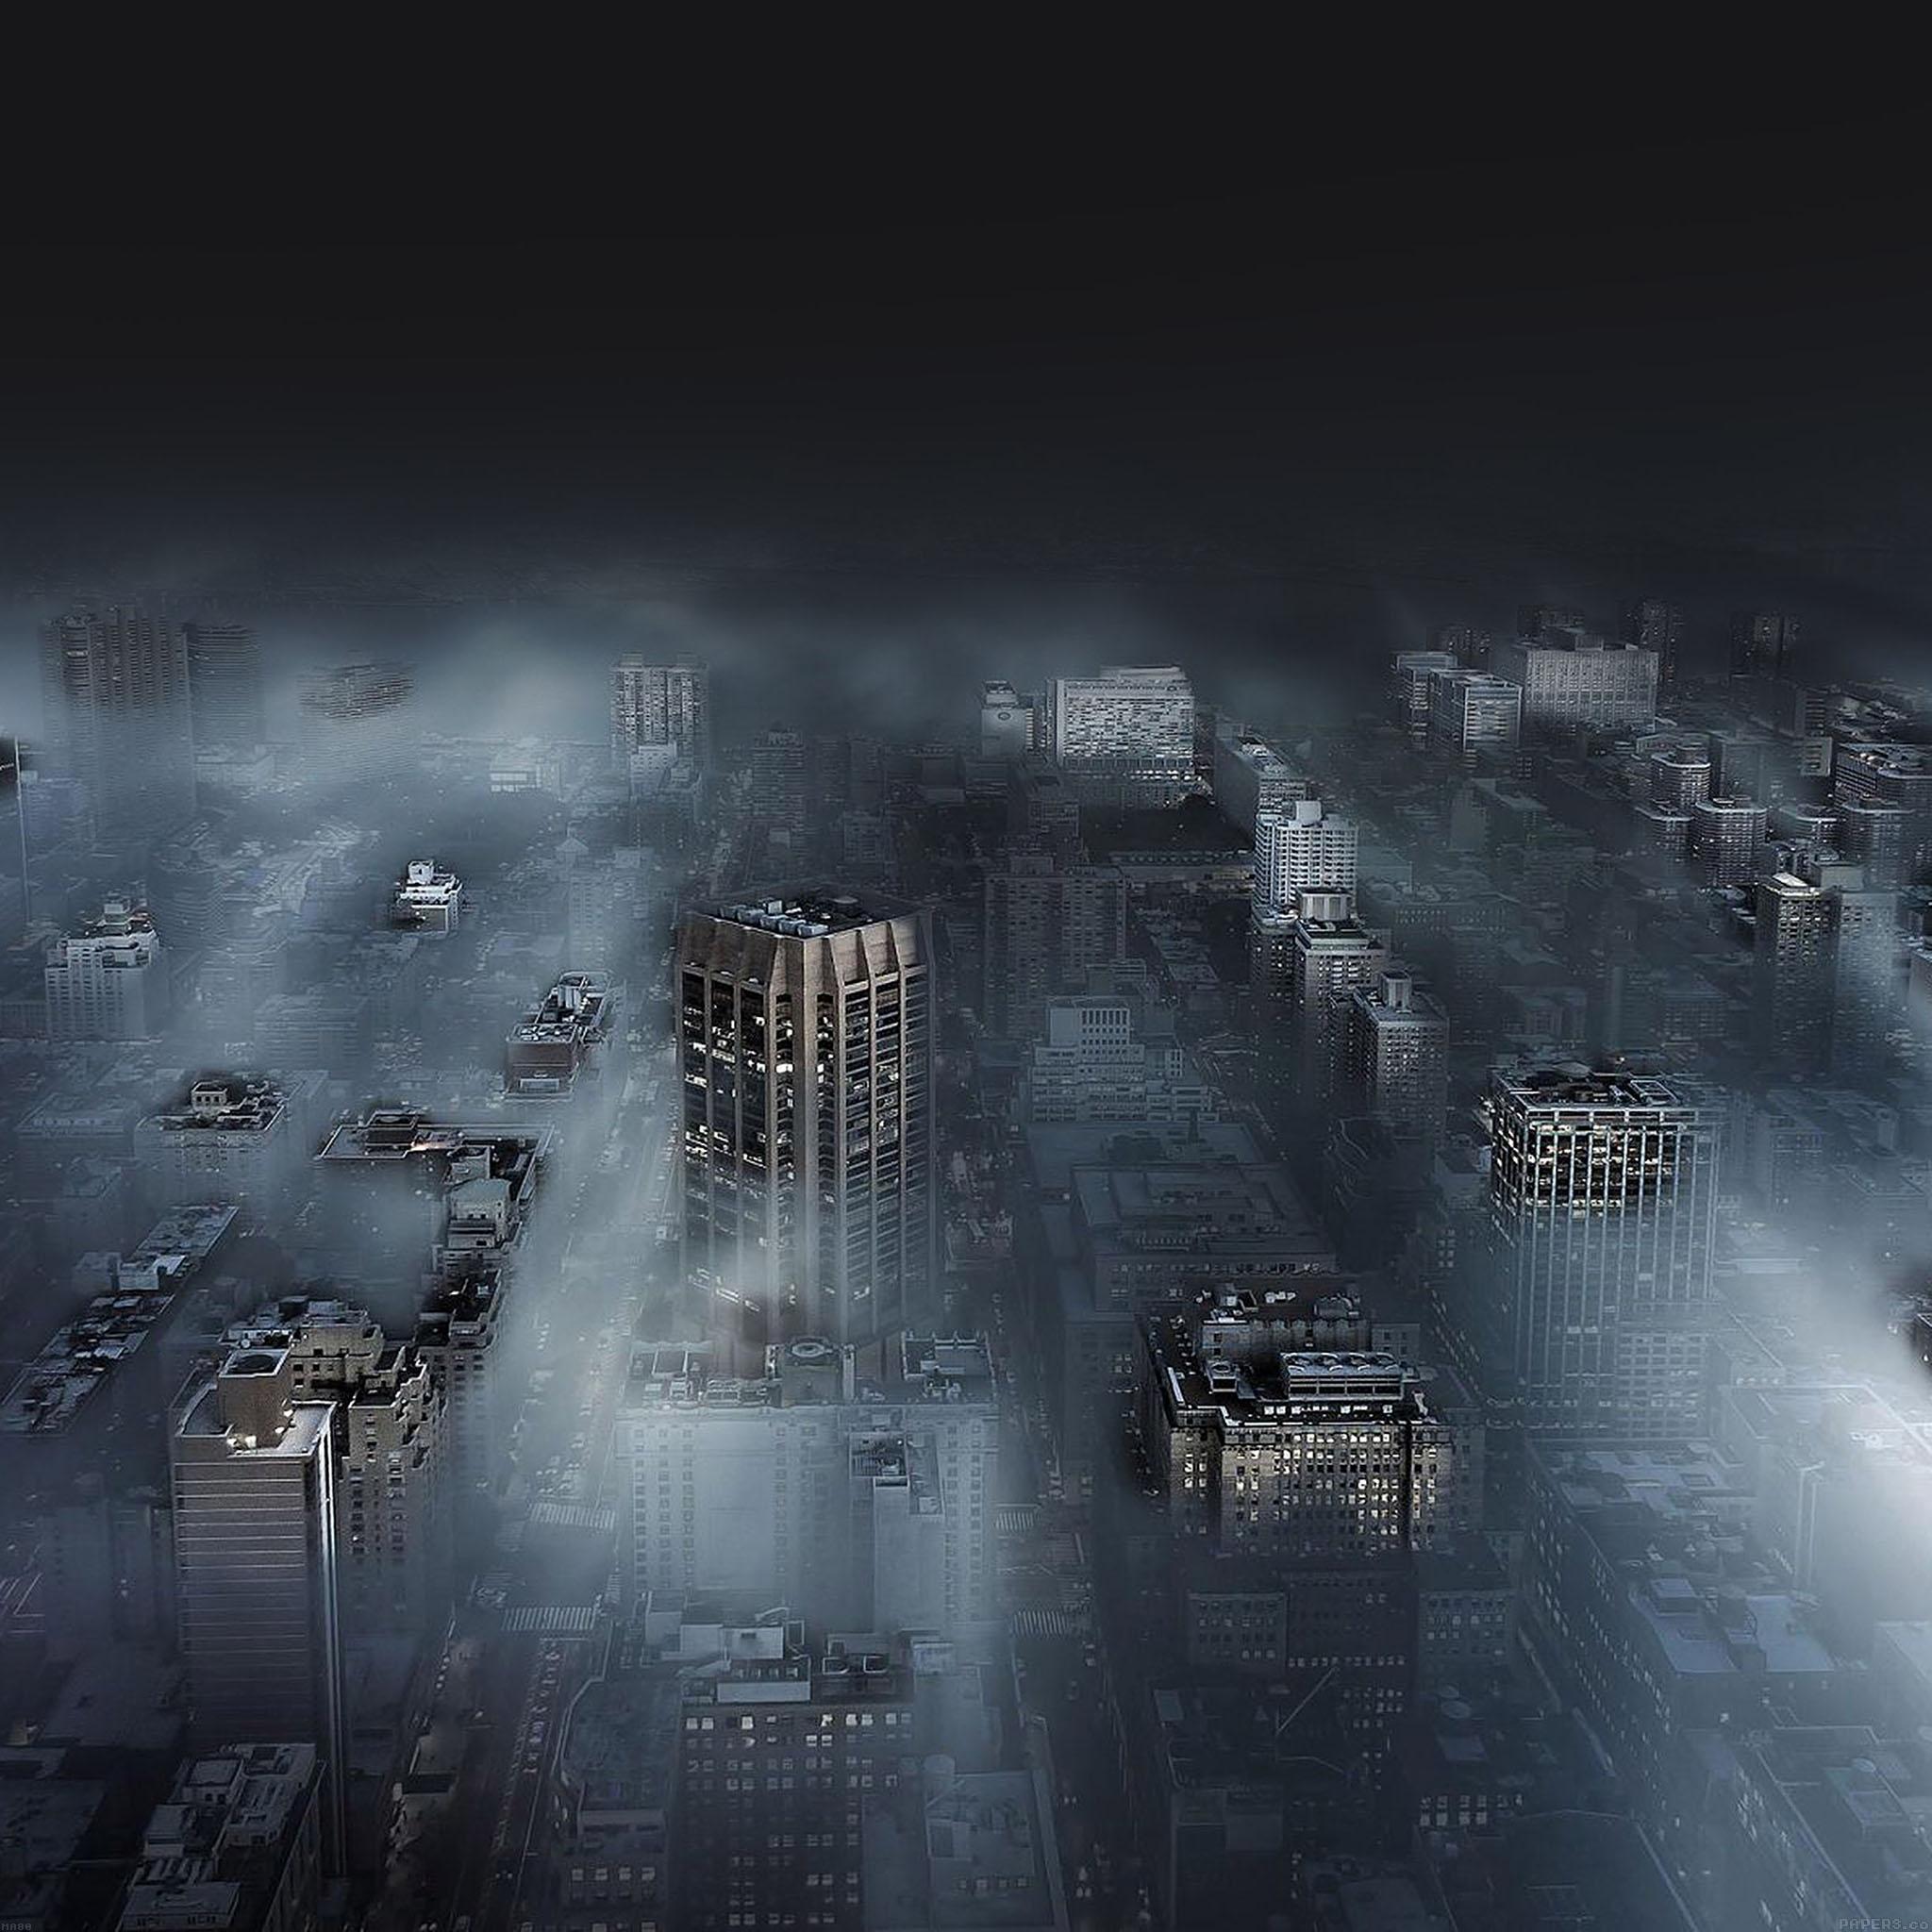 Ma80-dark-city-in-fog-nature-wallpaper